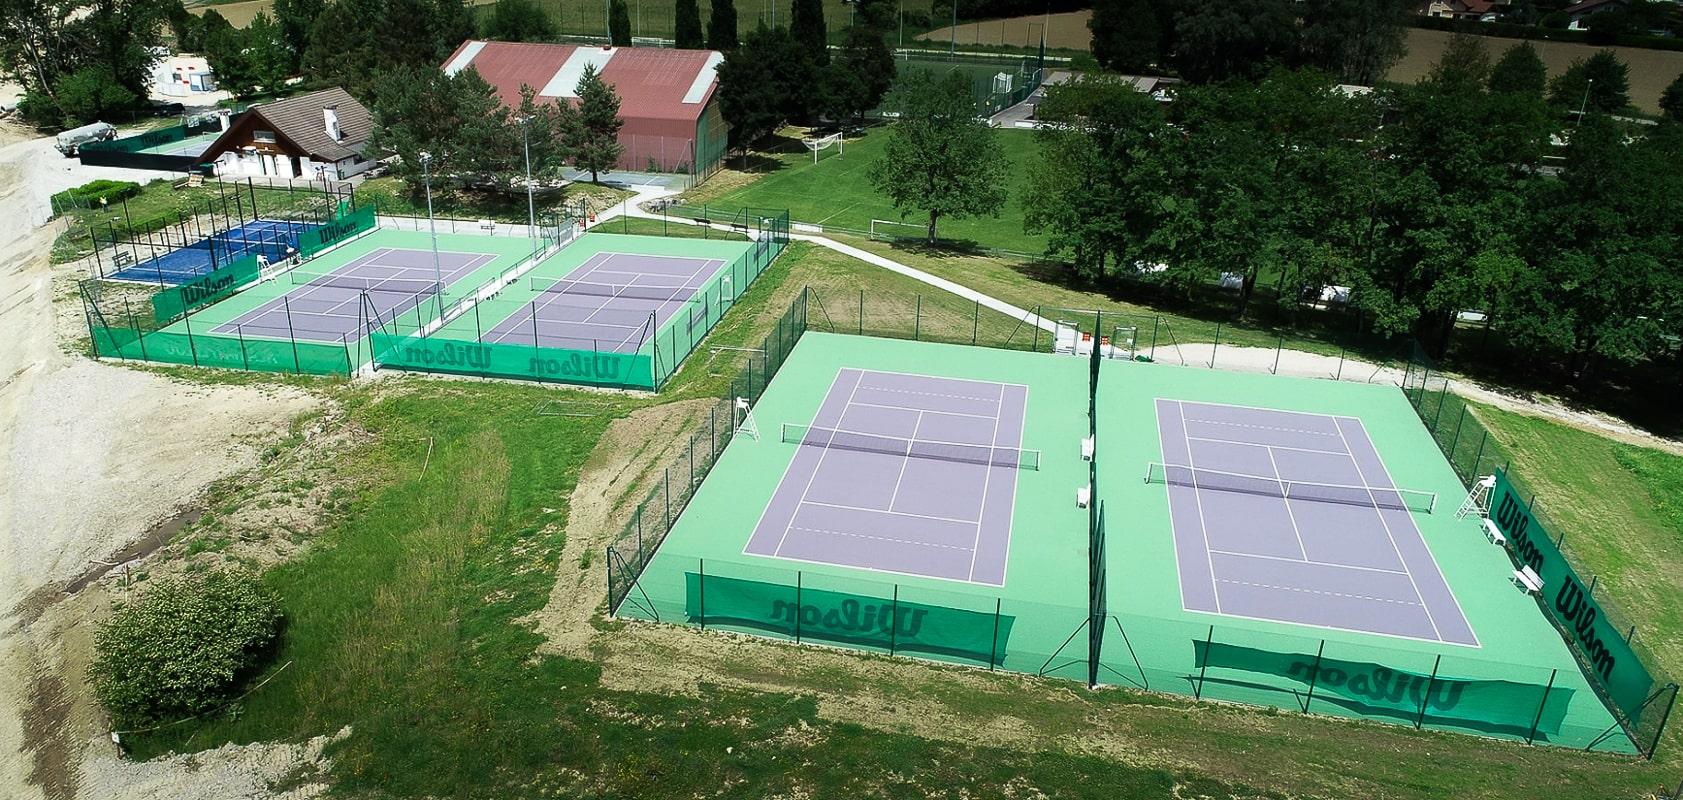 tennis club pringy annecy - vue aerienne